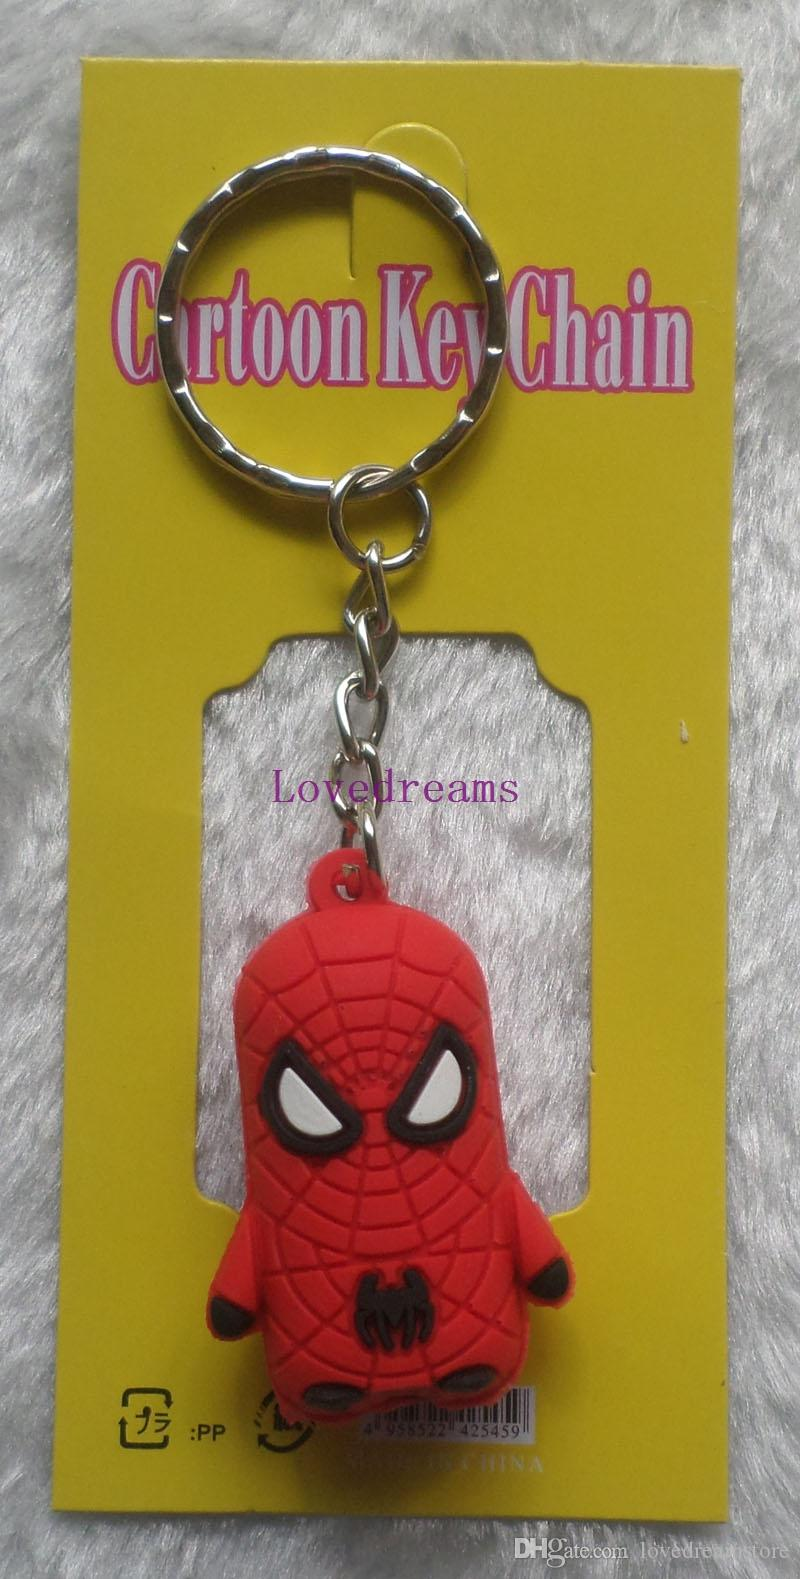 24 pezzi / 2 fogli supereroi Spiderman Thor Batman Iron Man Captain America Hulk portachiavi in gomma morbida portachiavi